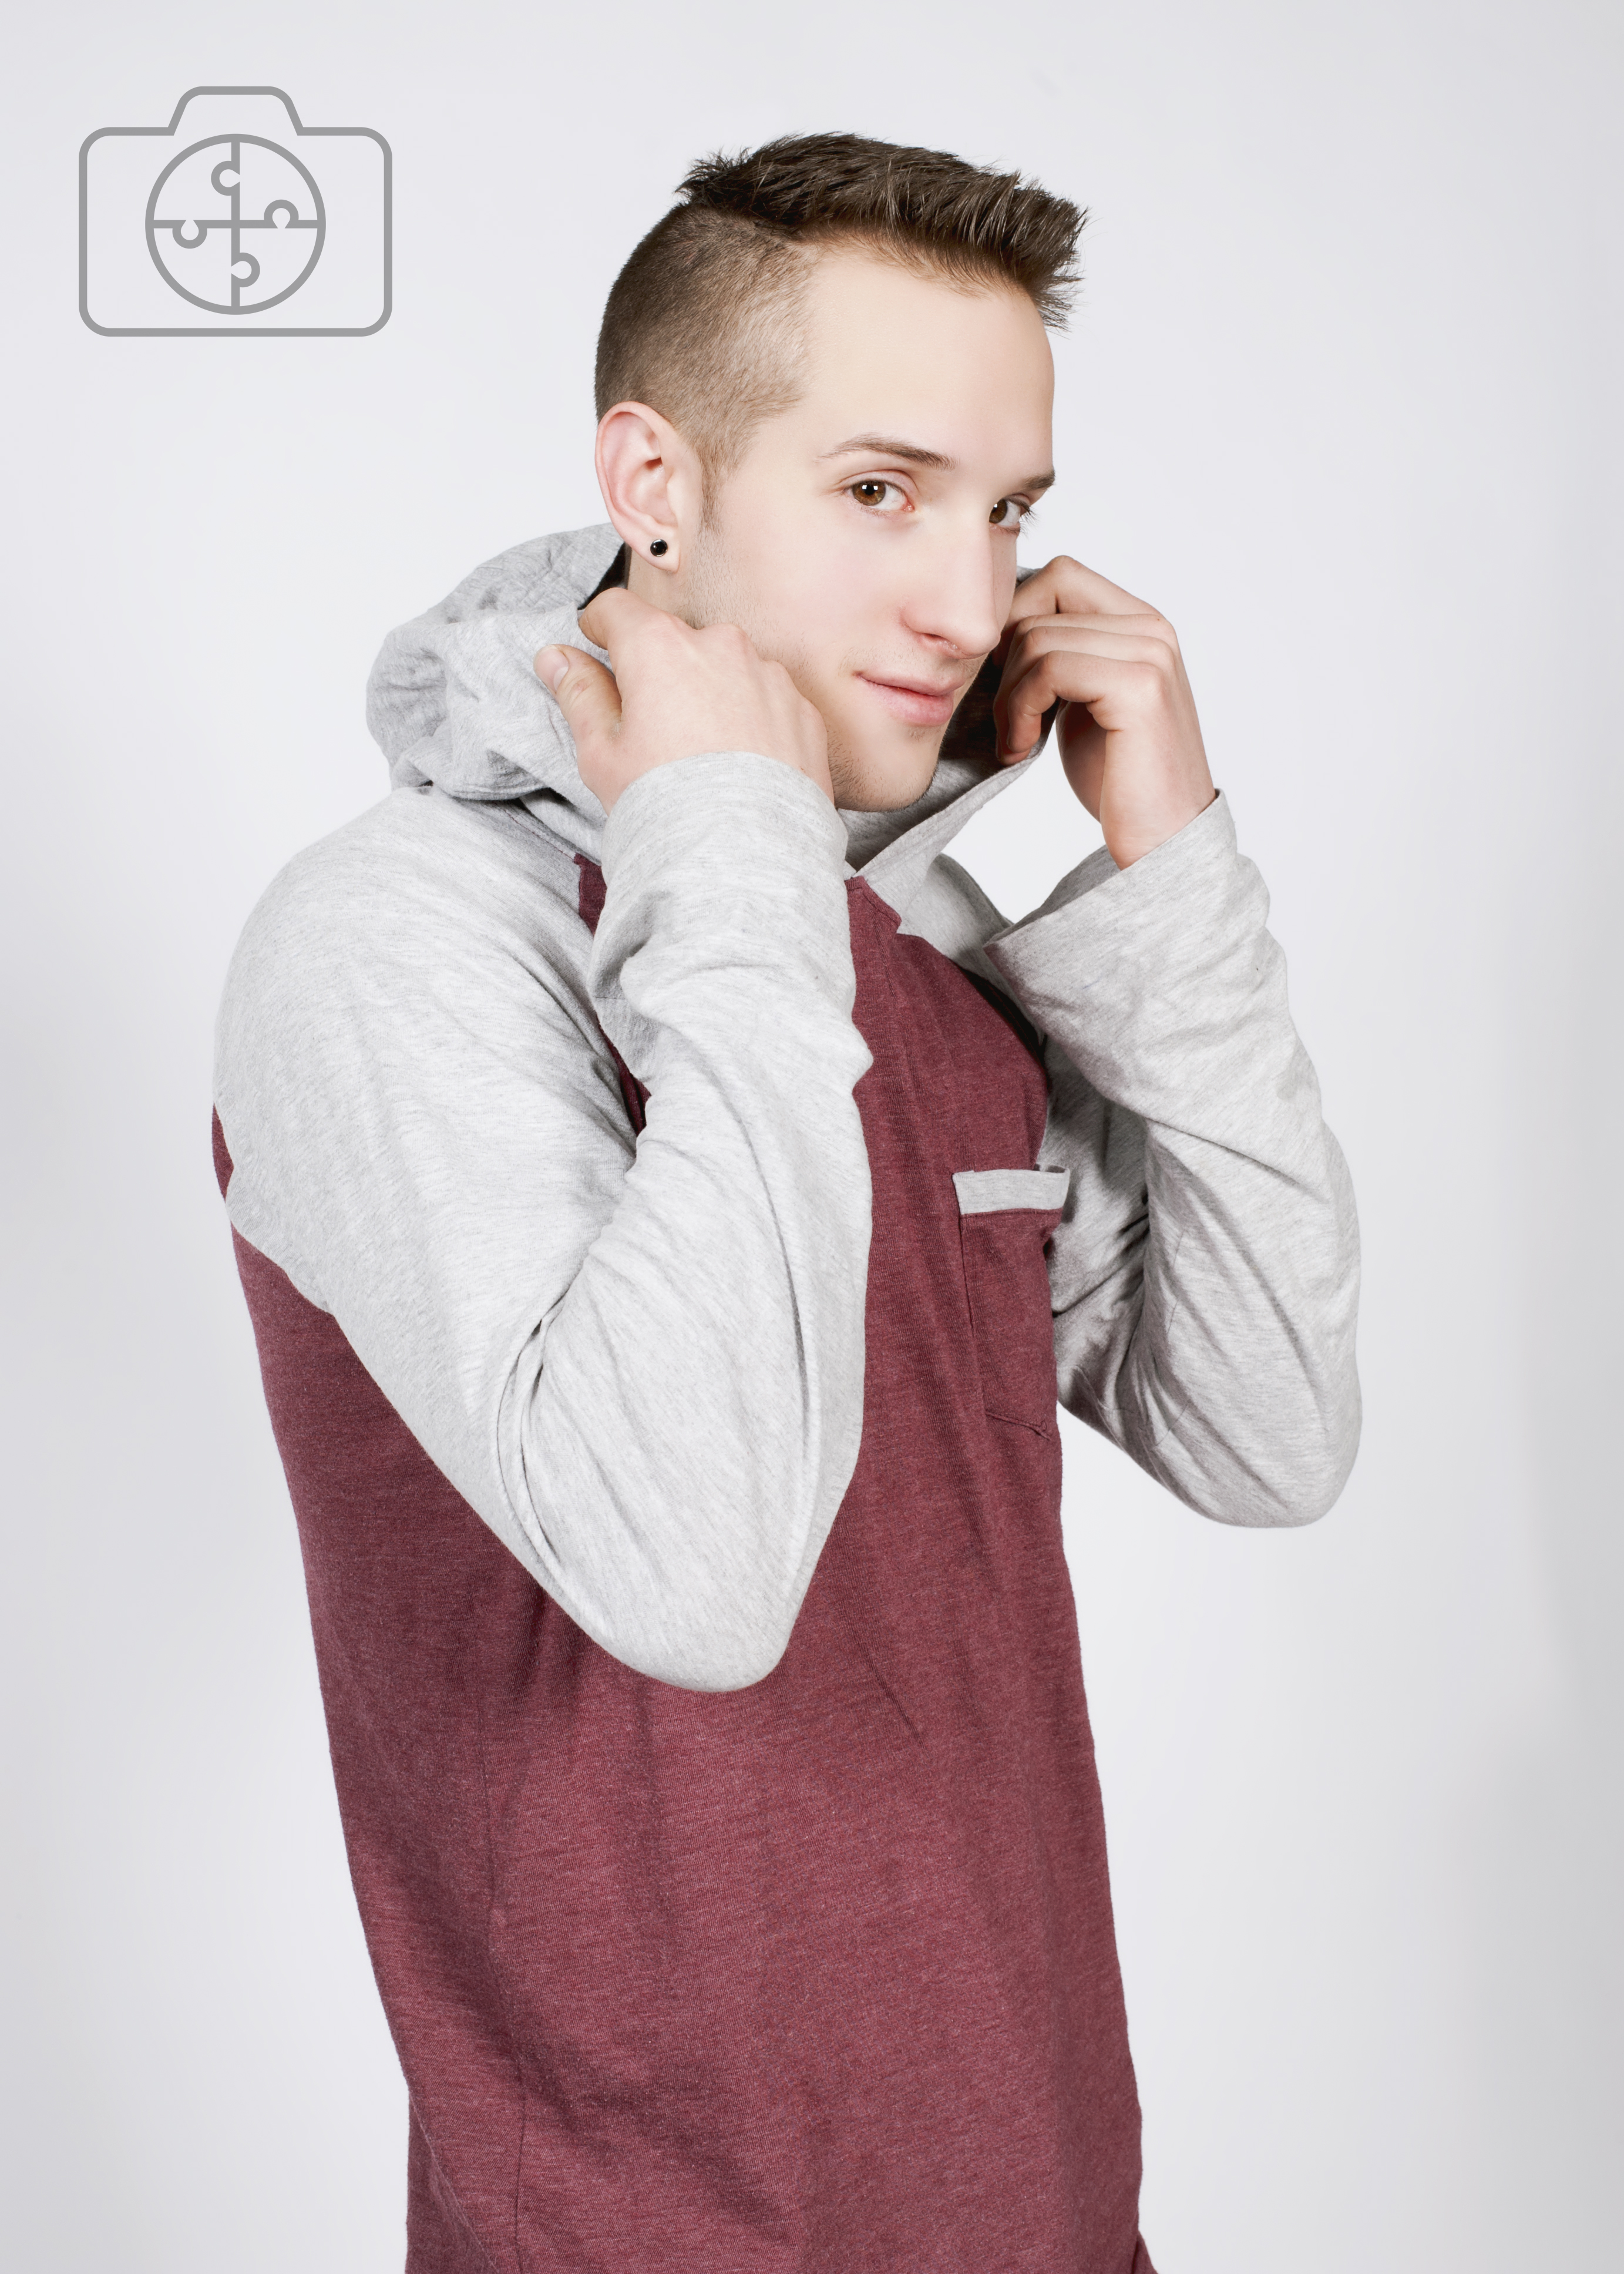 Model: Cedric